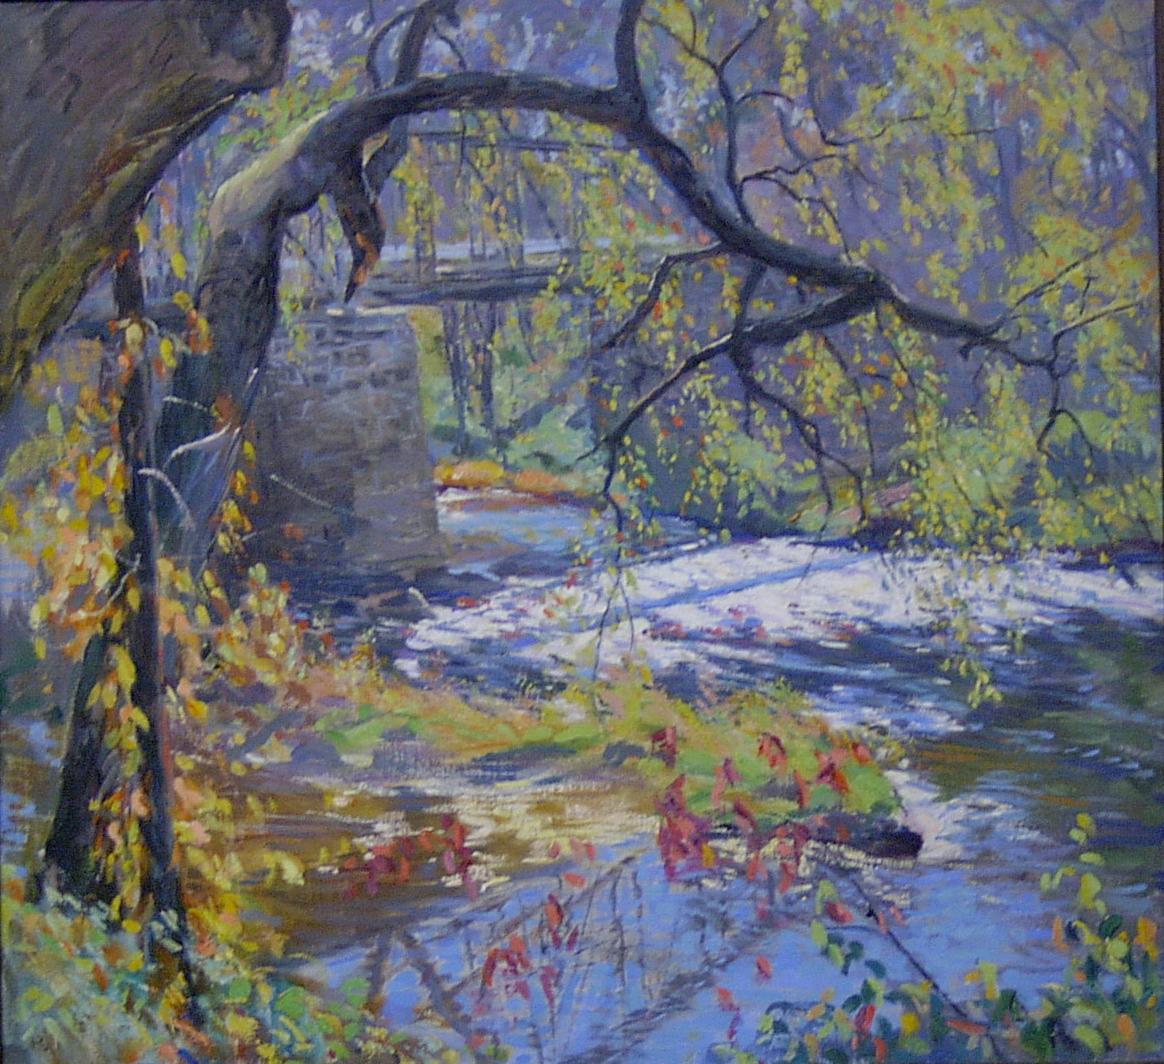 Woodhill Bridge, Autumn